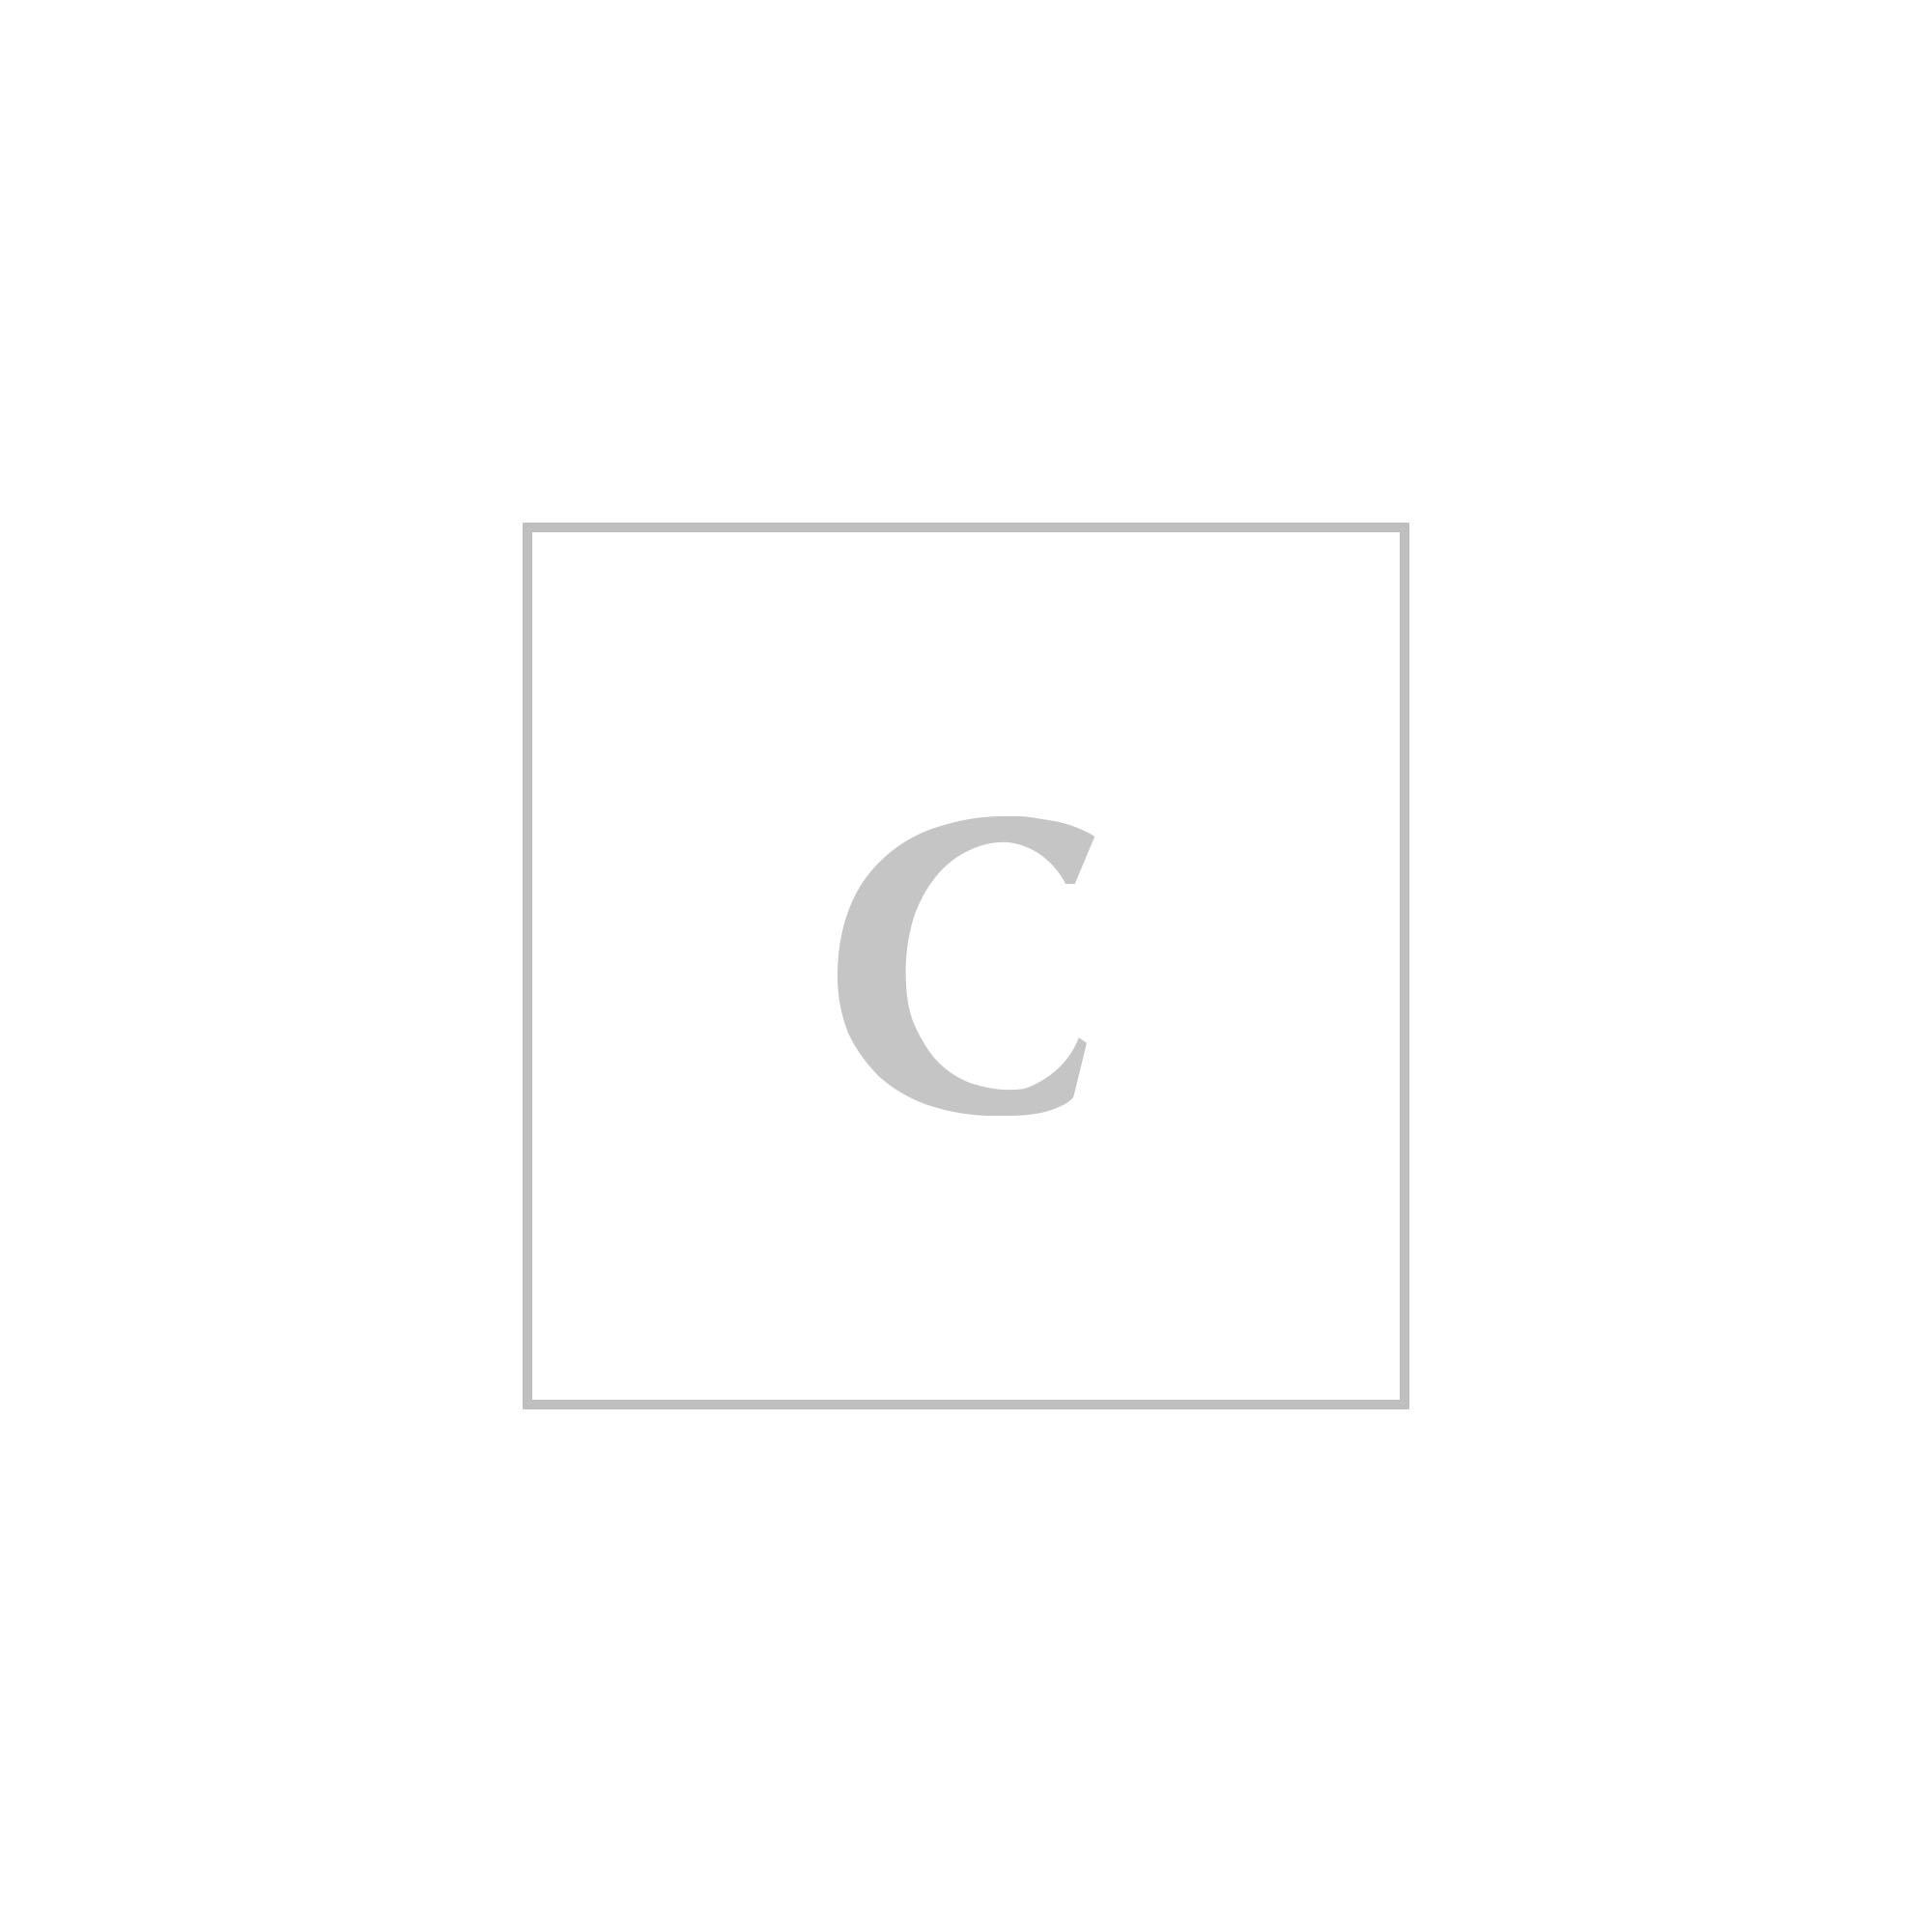 prada bags men seahorse logo clutch